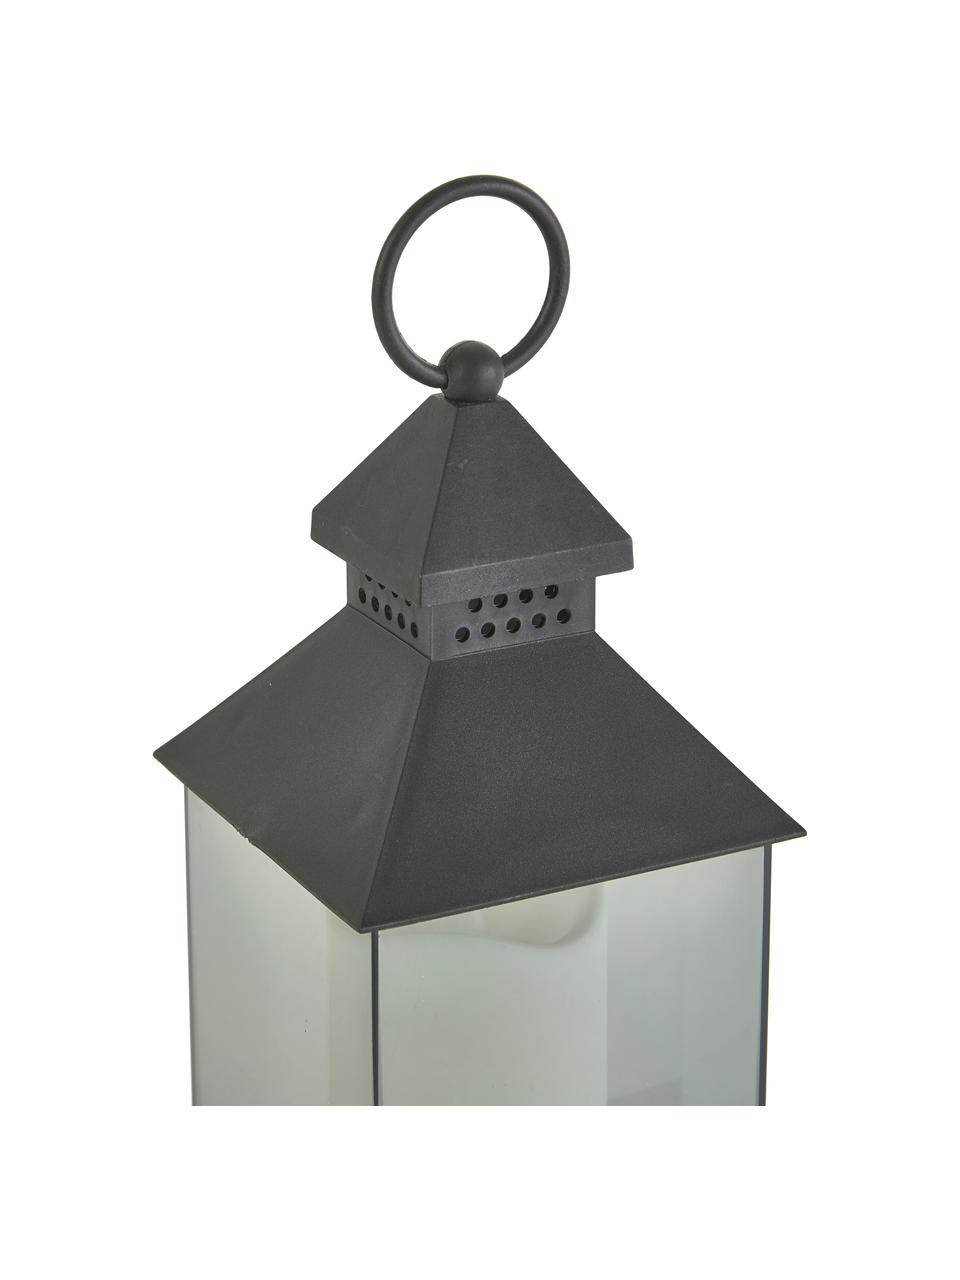 Mobile Laterne Flame mit LED-Kerzen, 6 Stück, Lampenschirm: Acryl, Schwarz, 10 x 25 cm